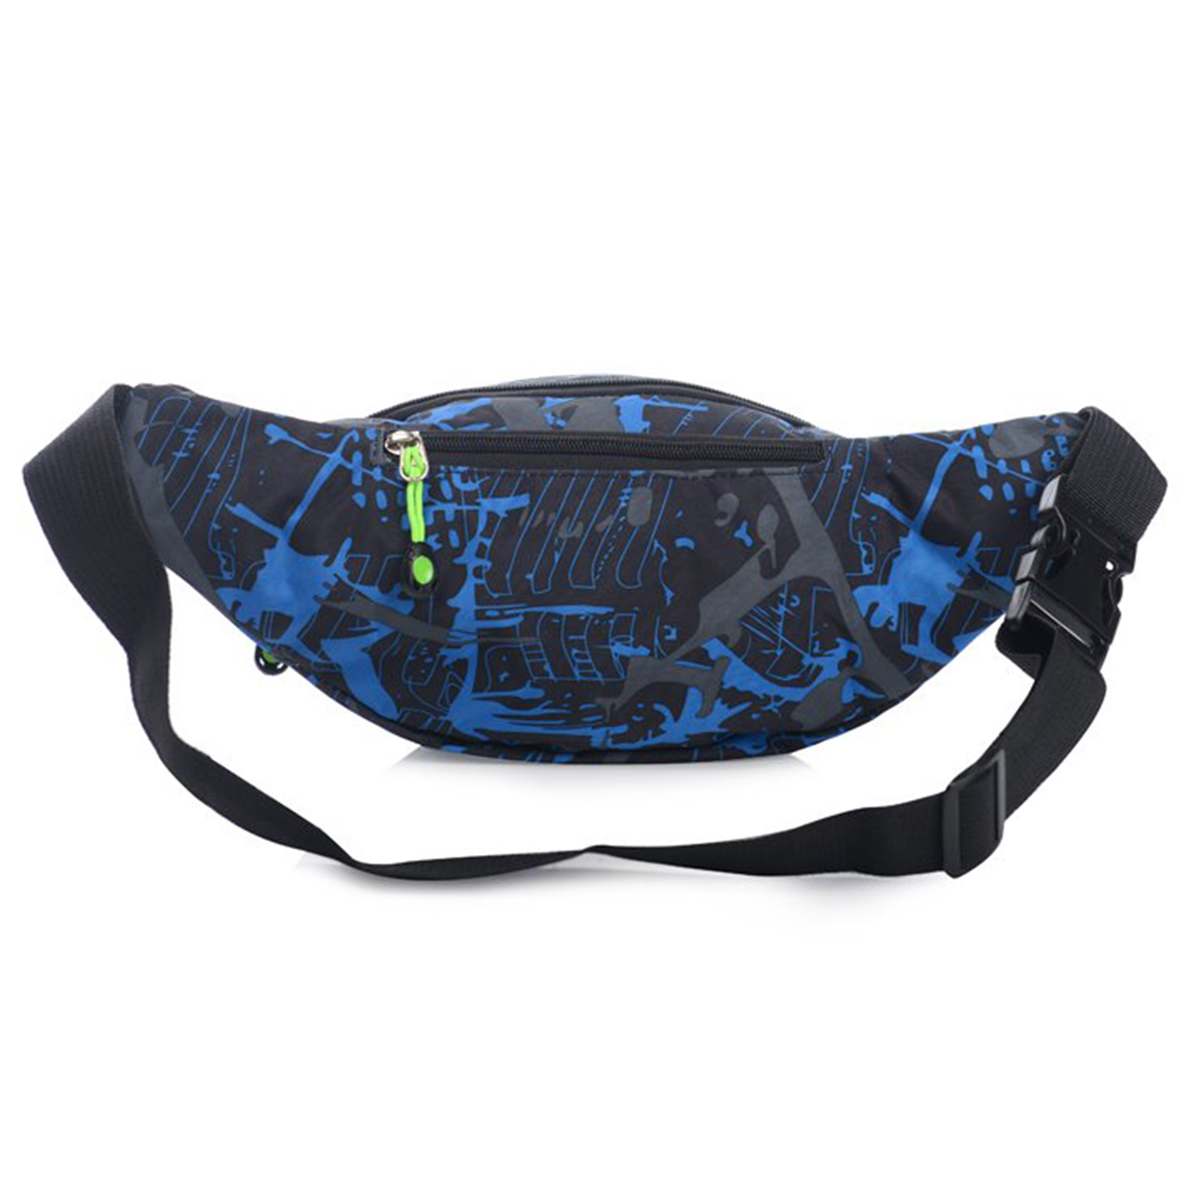 Outdoor Sports Waist Bag Crossbody Bag Phone Bag For Hiking Jogging Climbing